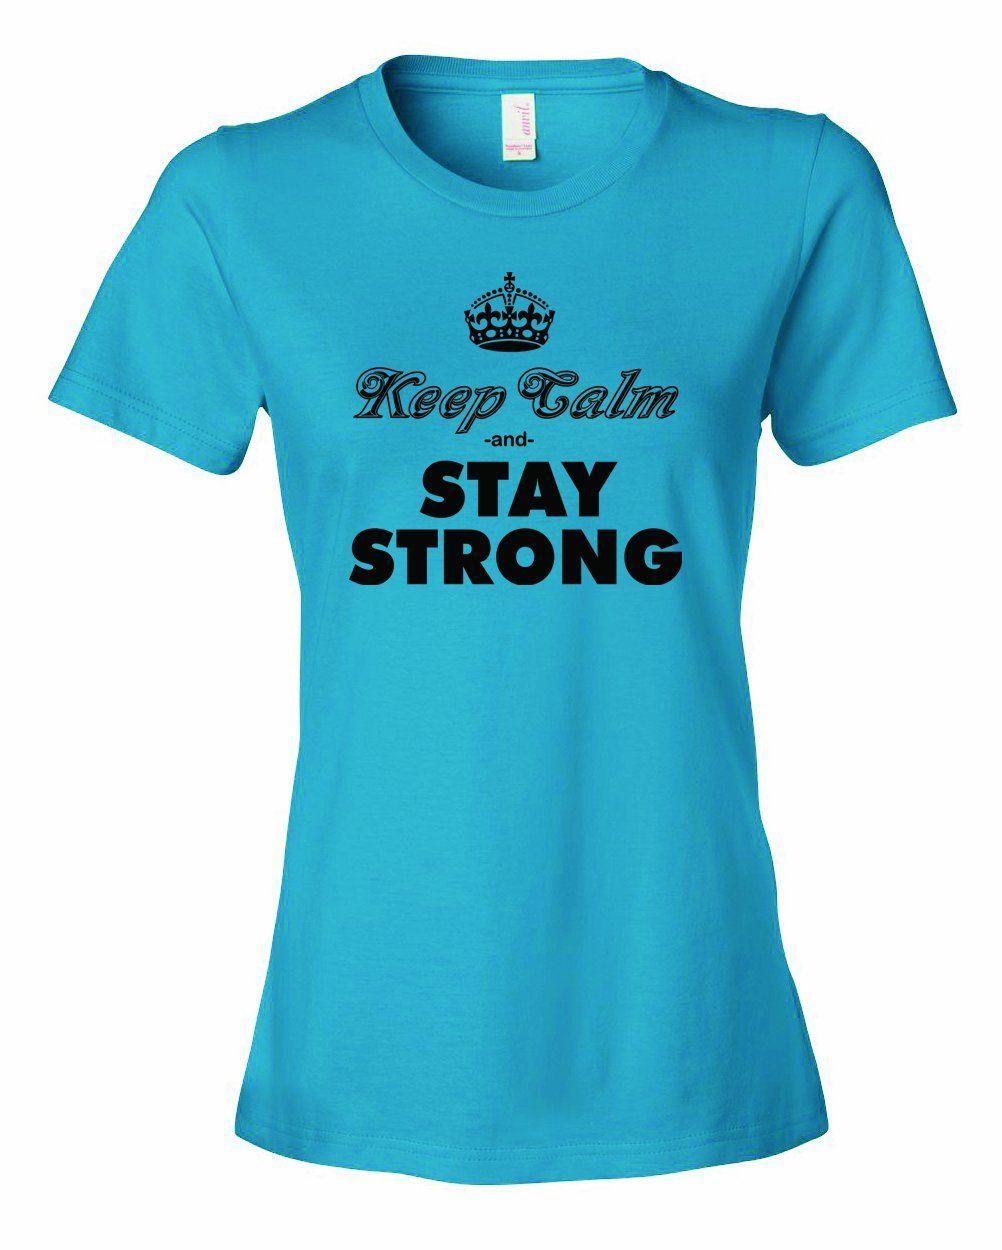 Autism Awareness Sweatshirt TooLoud Big Puzzle Heart